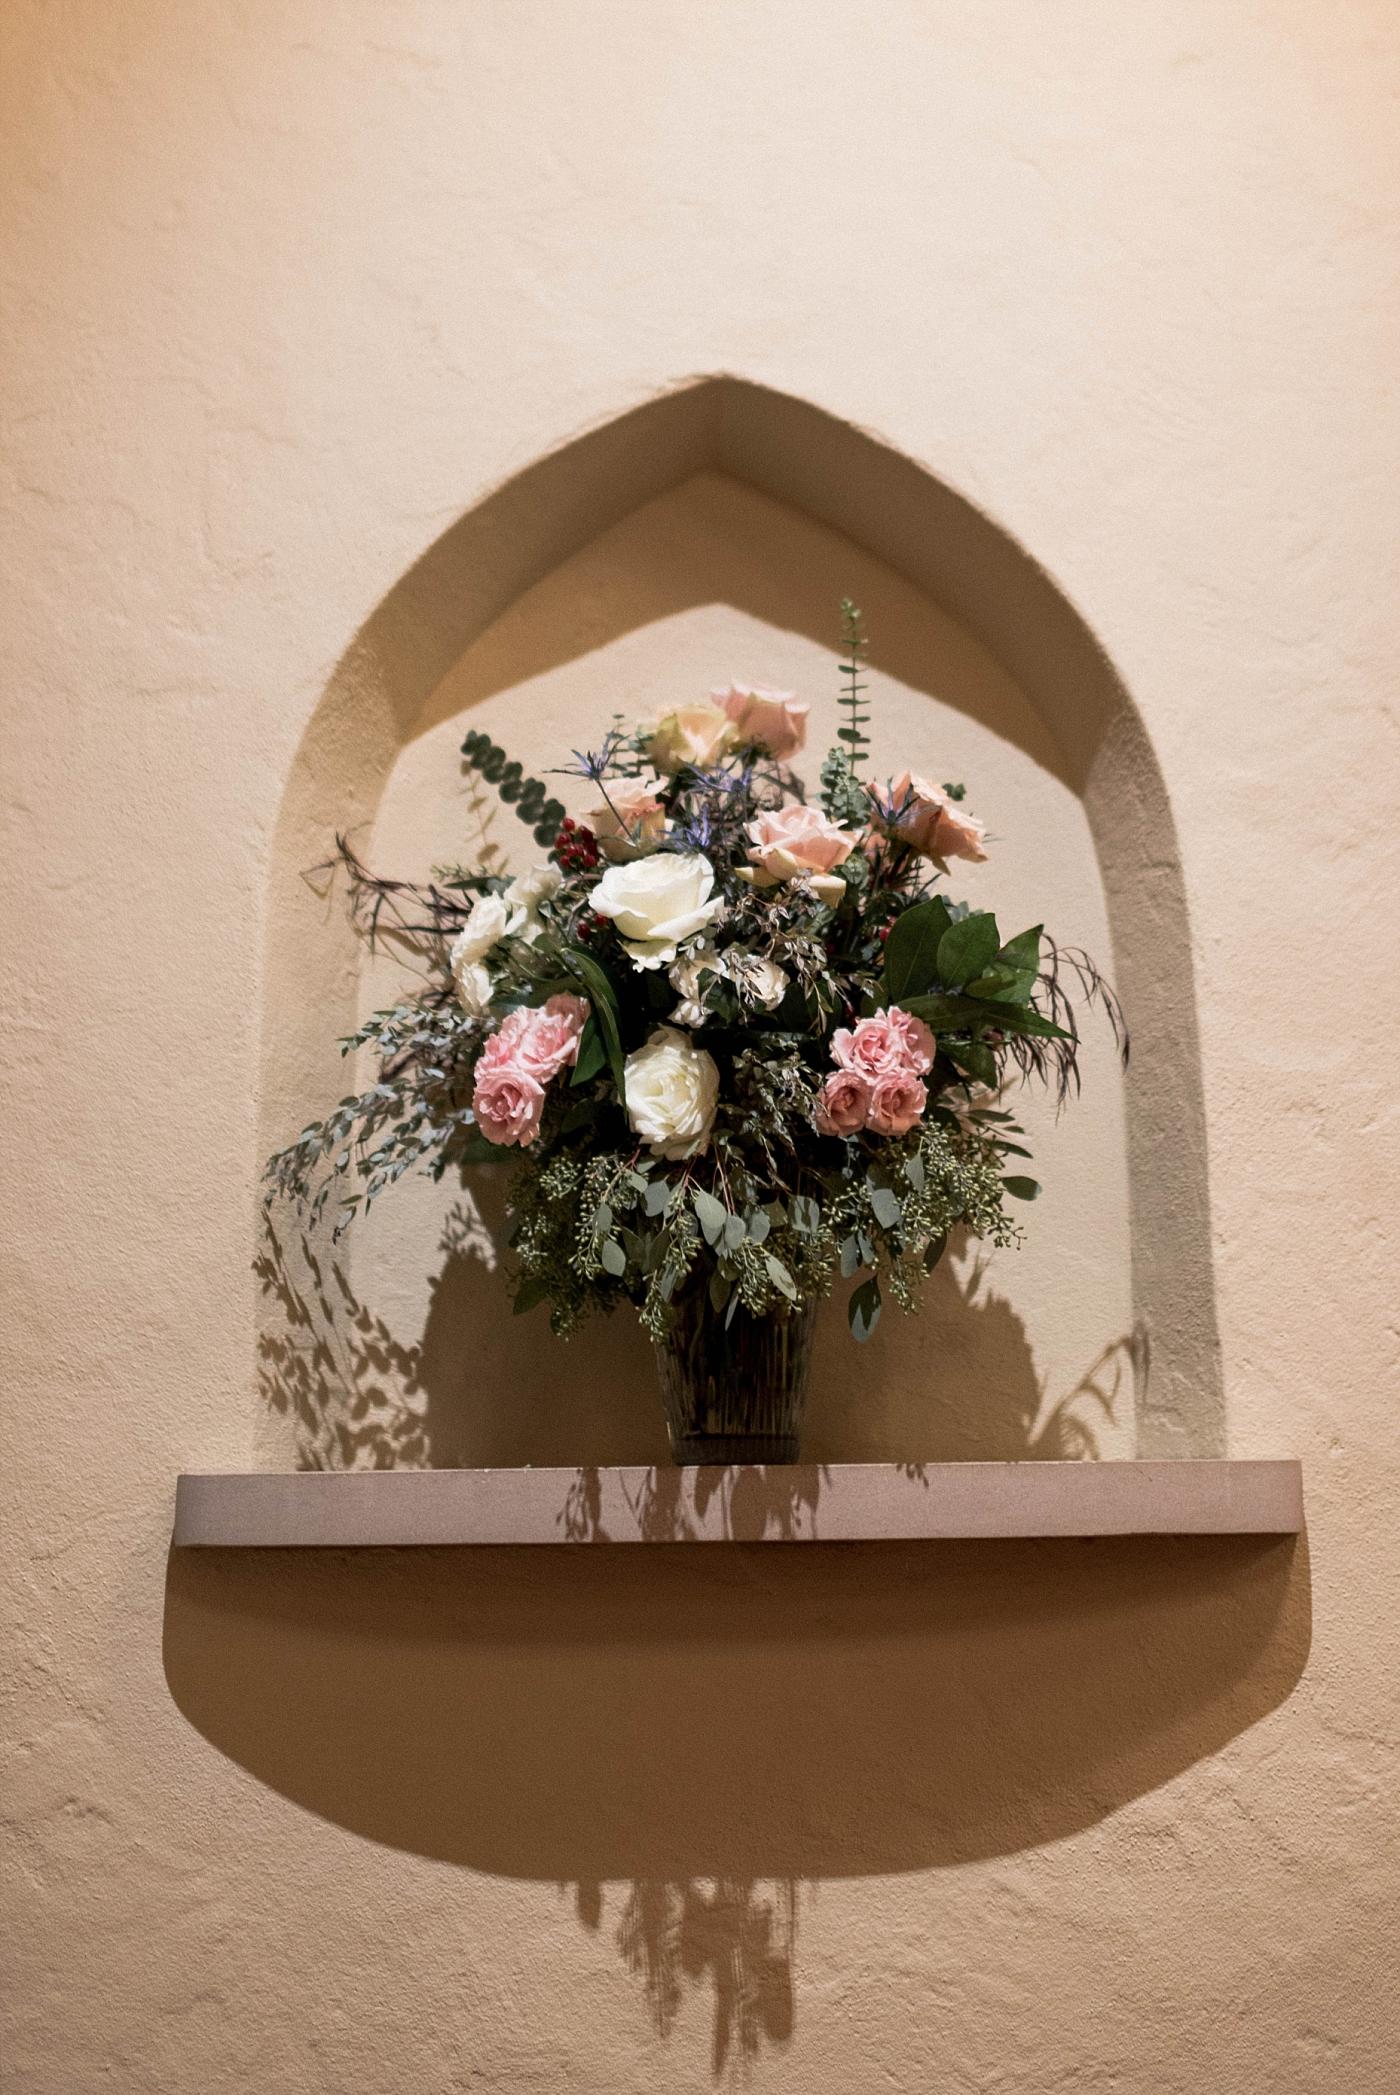 Flowers floral wedding details church chapel bride groom